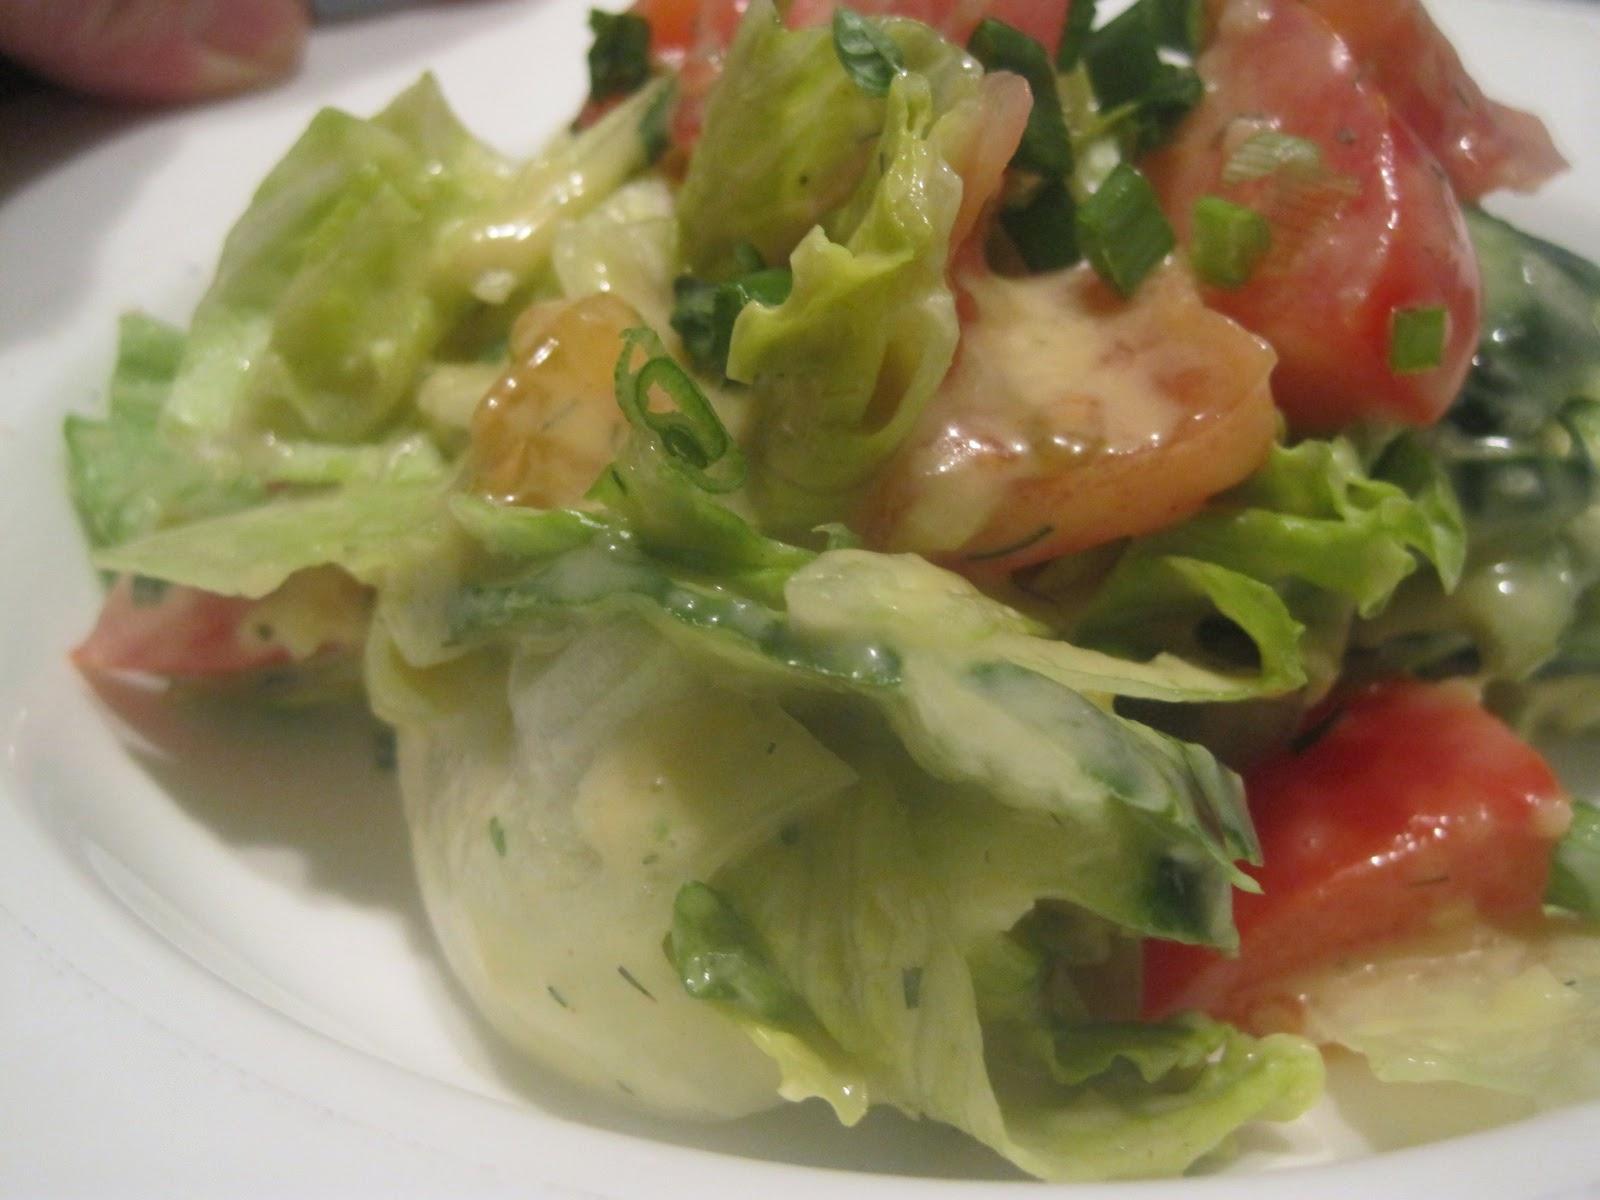 glatzkochs welt salat mit bananen senf dressing. Black Bedroom Furniture Sets. Home Design Ideas